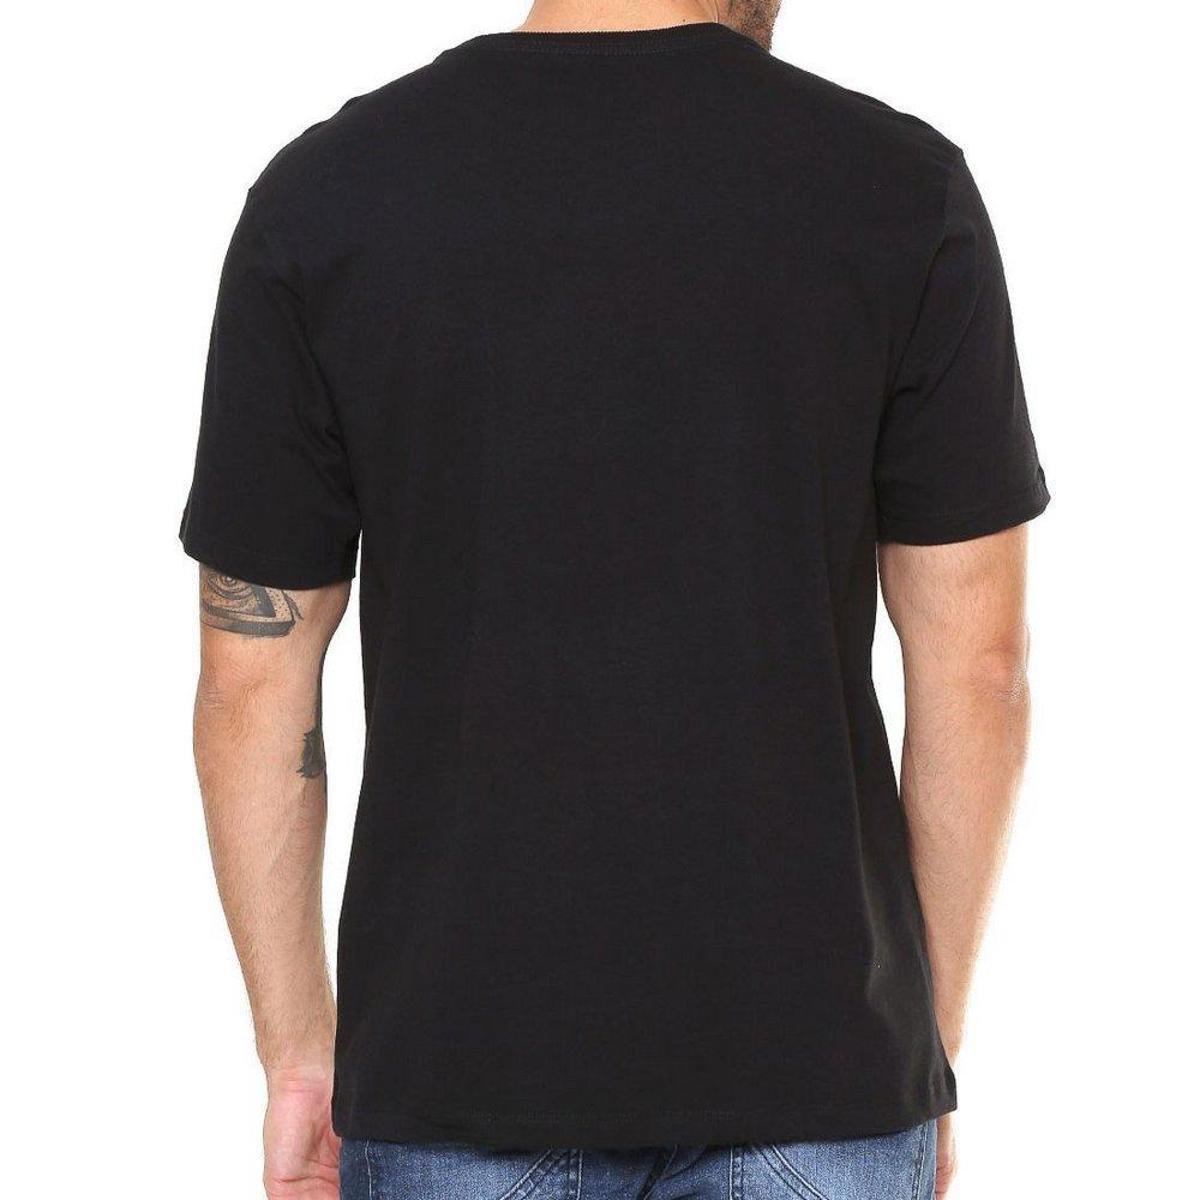 Camiseta Hurley Silk Hawaii Hunt - Preto - Compre Agora  5de85b333cc